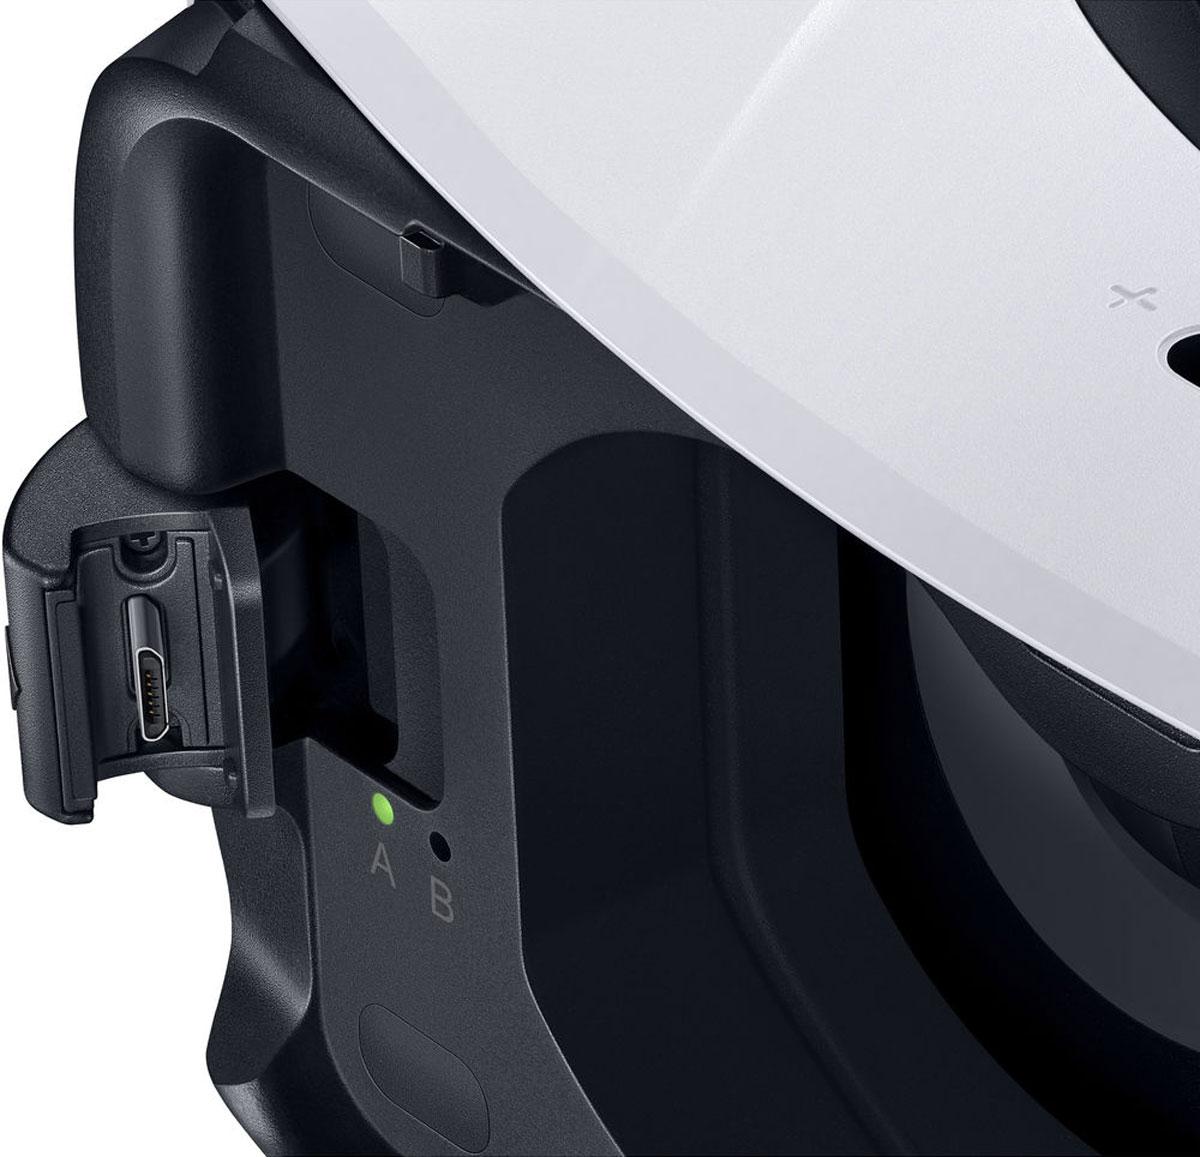 Samsung SM-R322 Gear VR, Black White очки виртуальной реальности